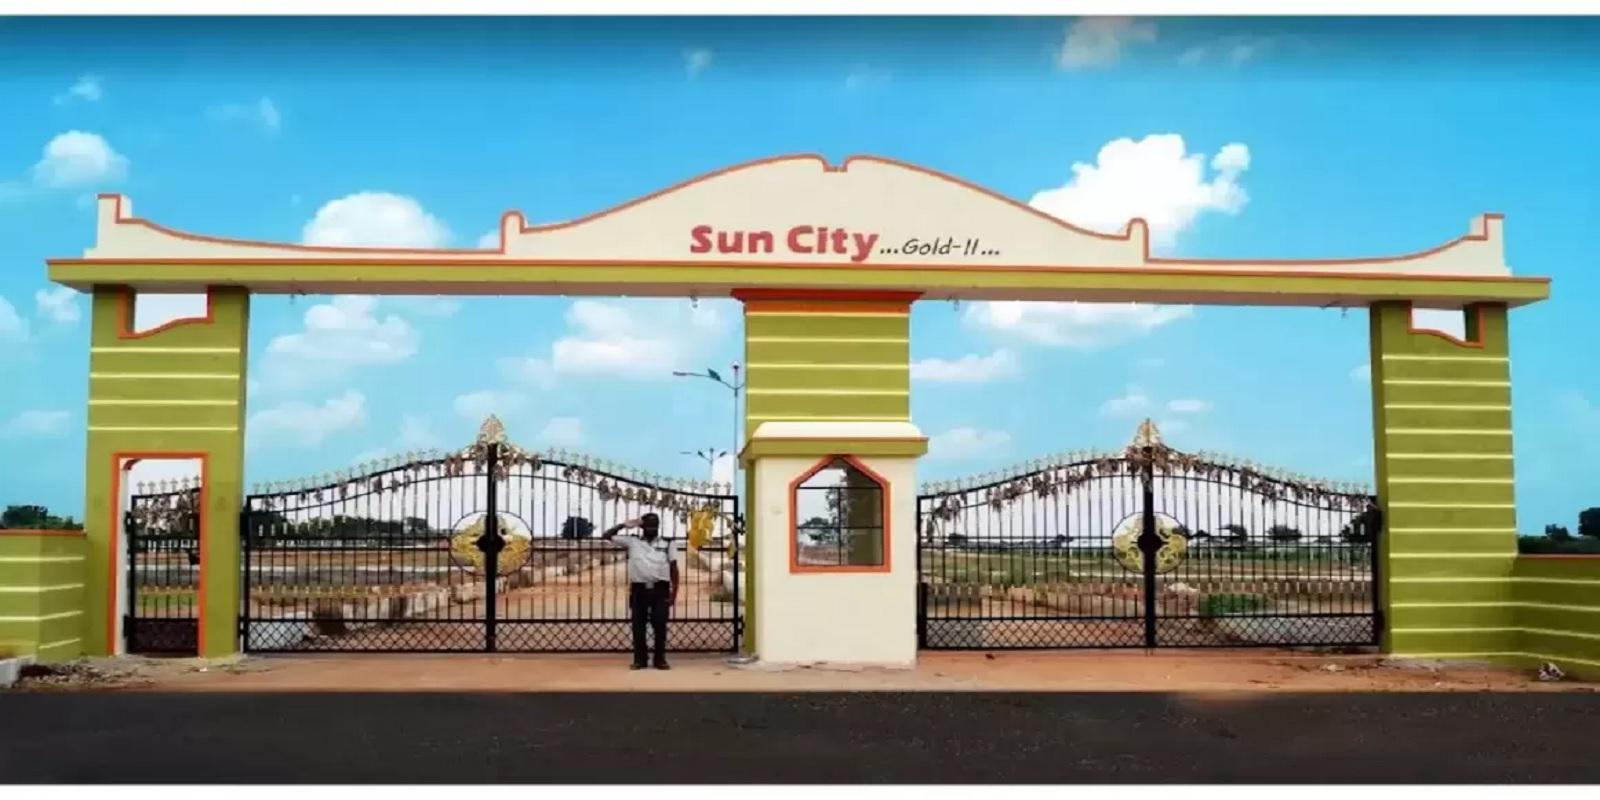 jsr sun city project project large image1